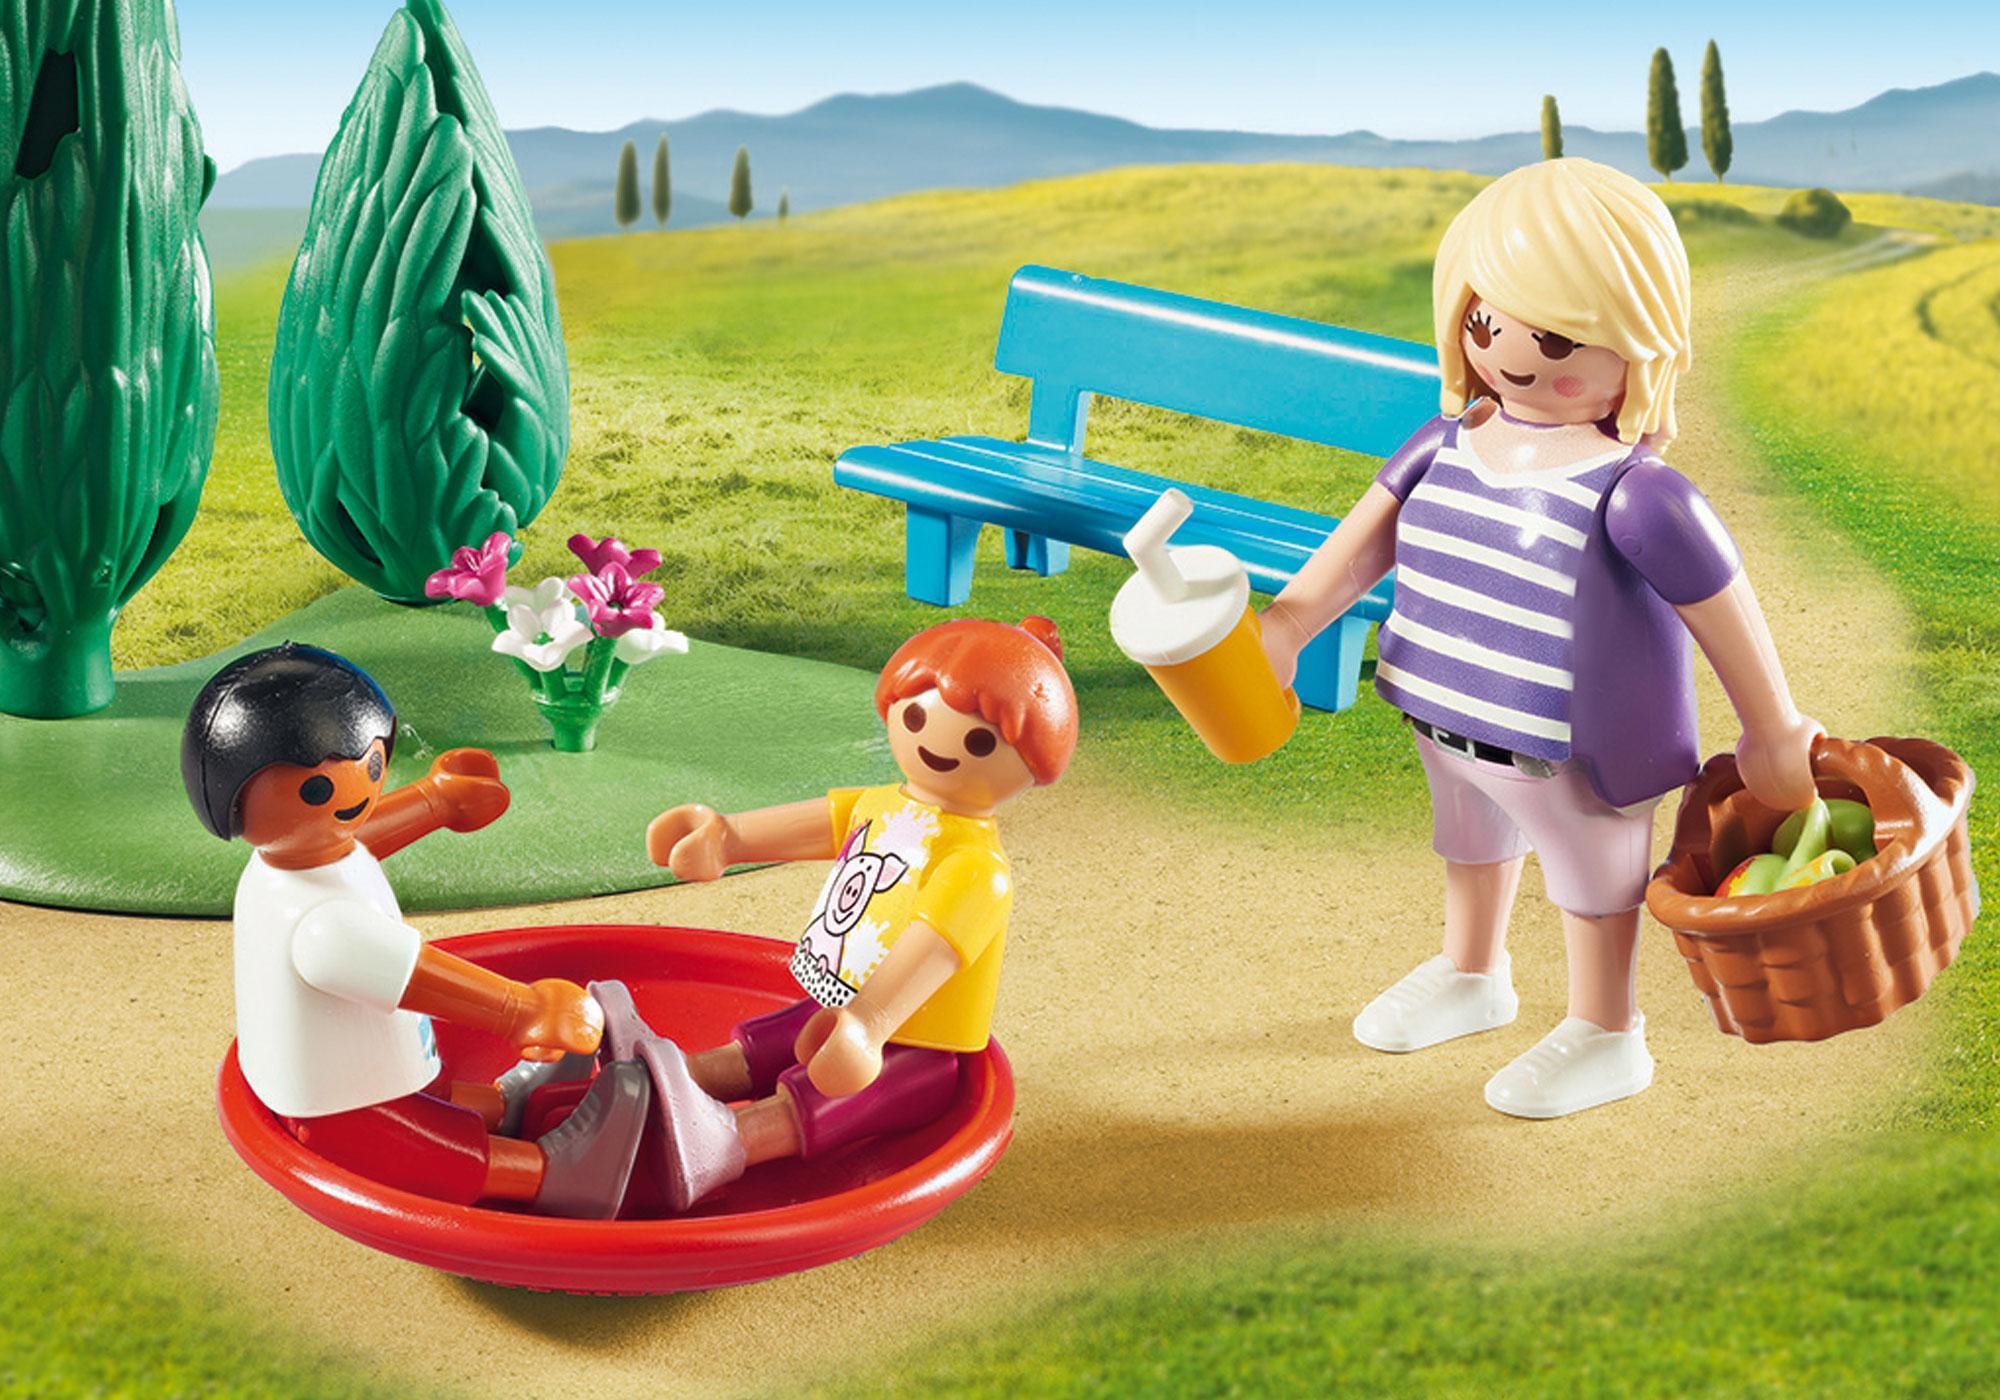 http://media.playmobil.com/i/playmobil/9423_product_extra2/Υπαίθριος παιδότοπος